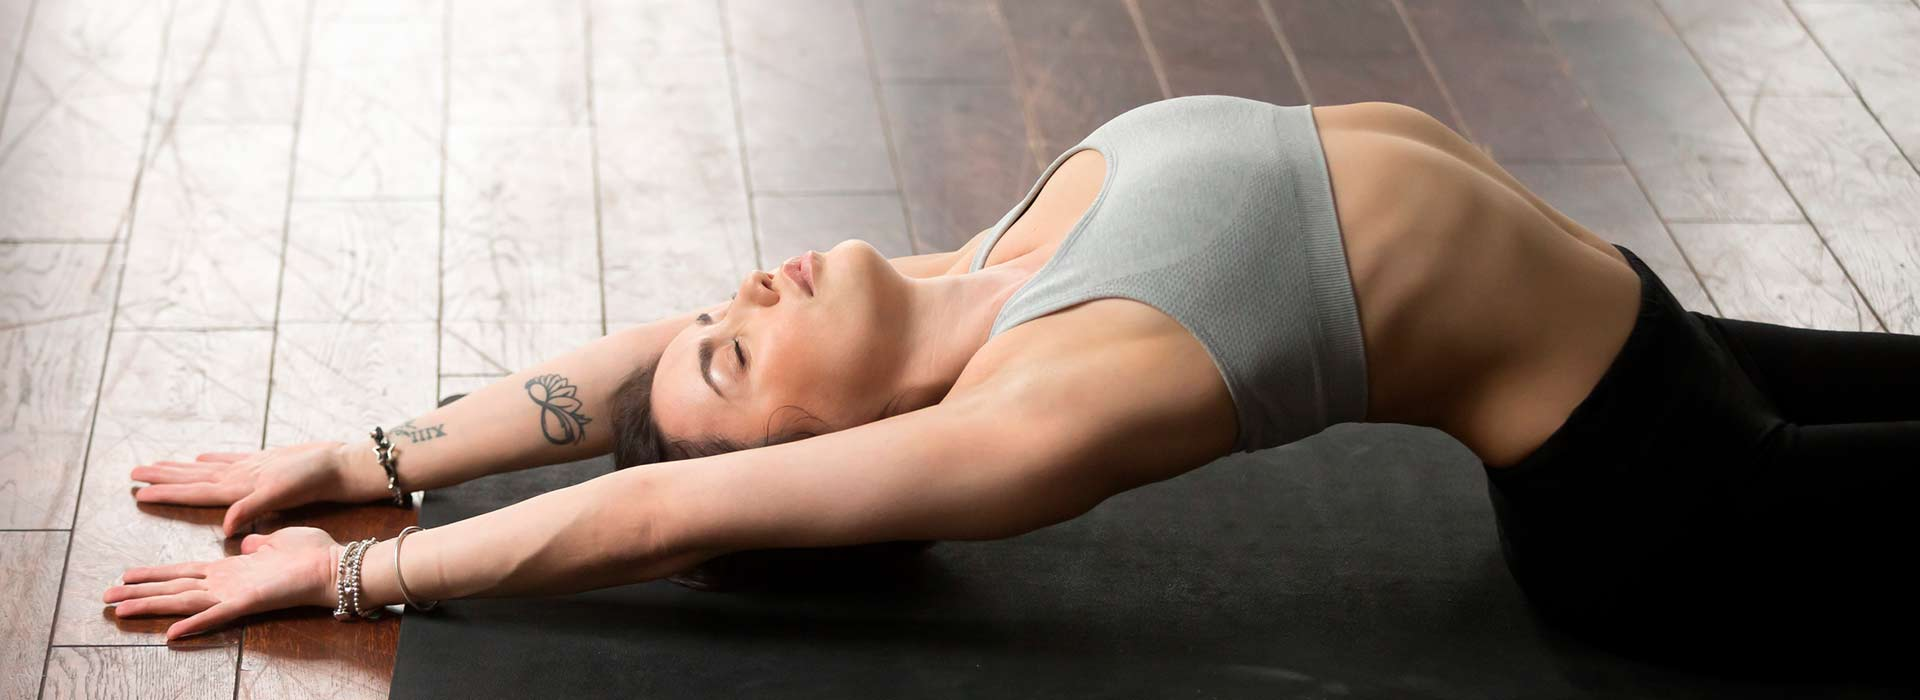 Das Risiko muskulärer Dysbalancen.